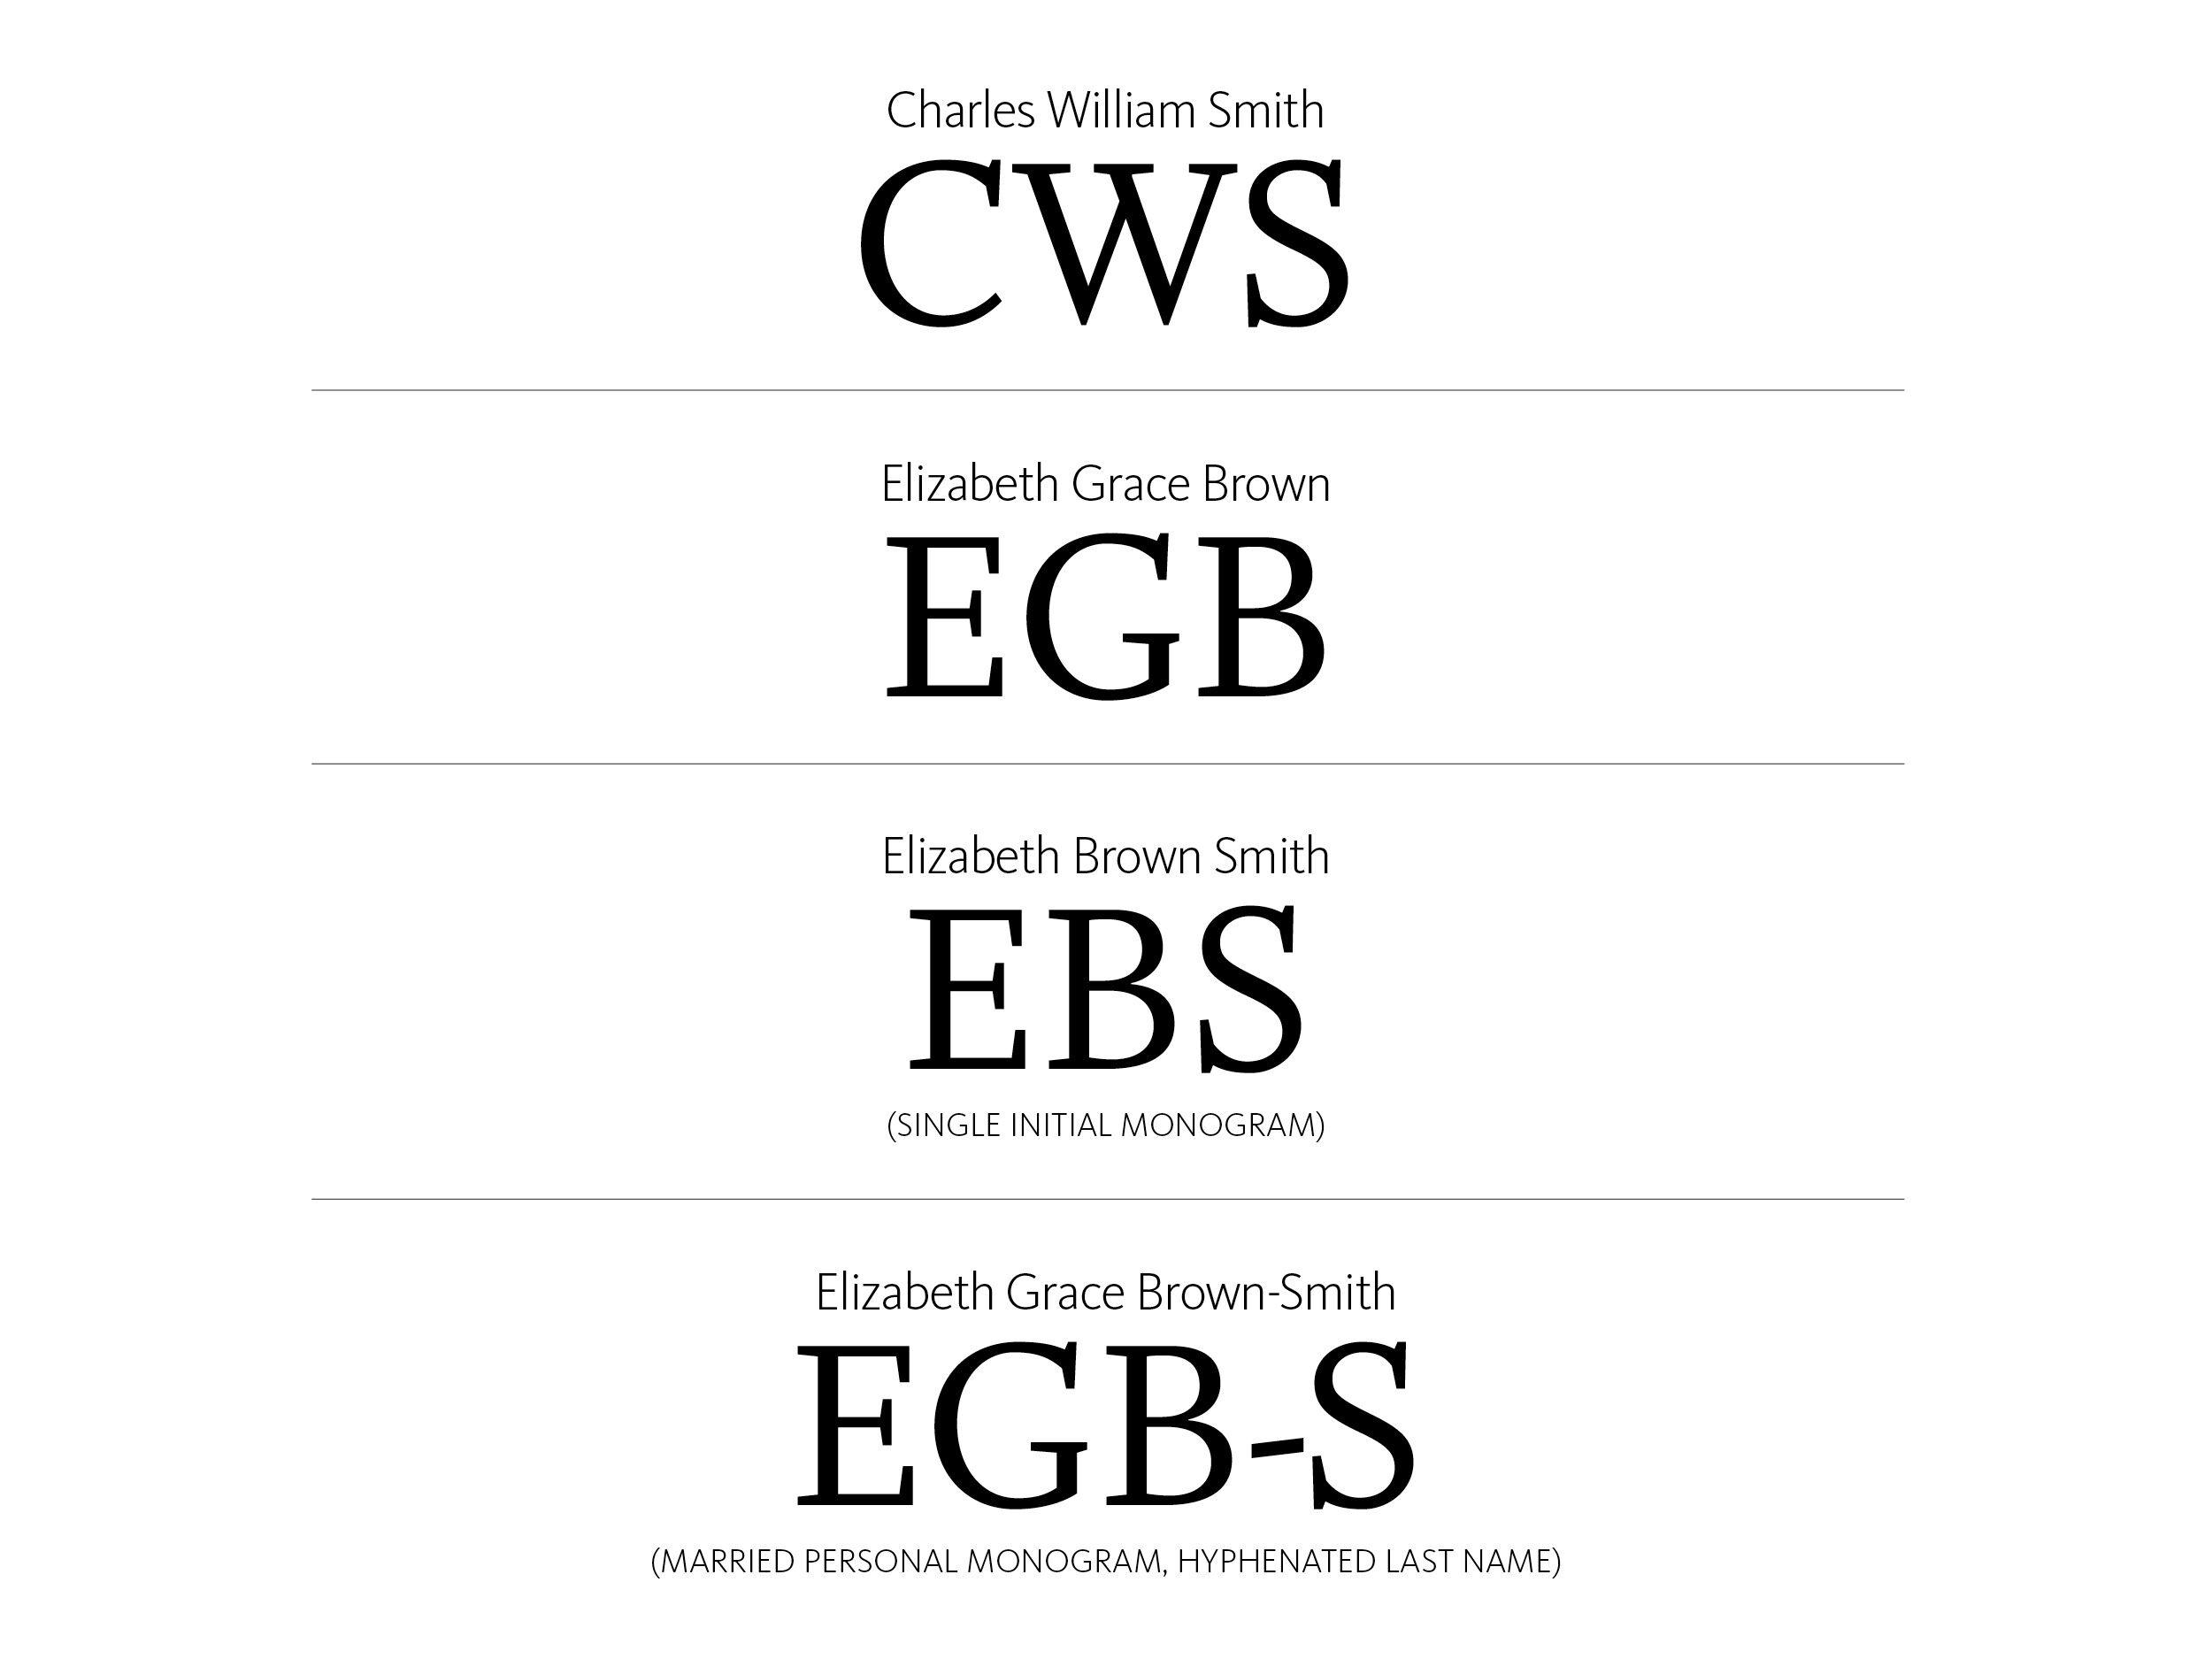 f38ed80b06 Monograms 101: How to Monogram